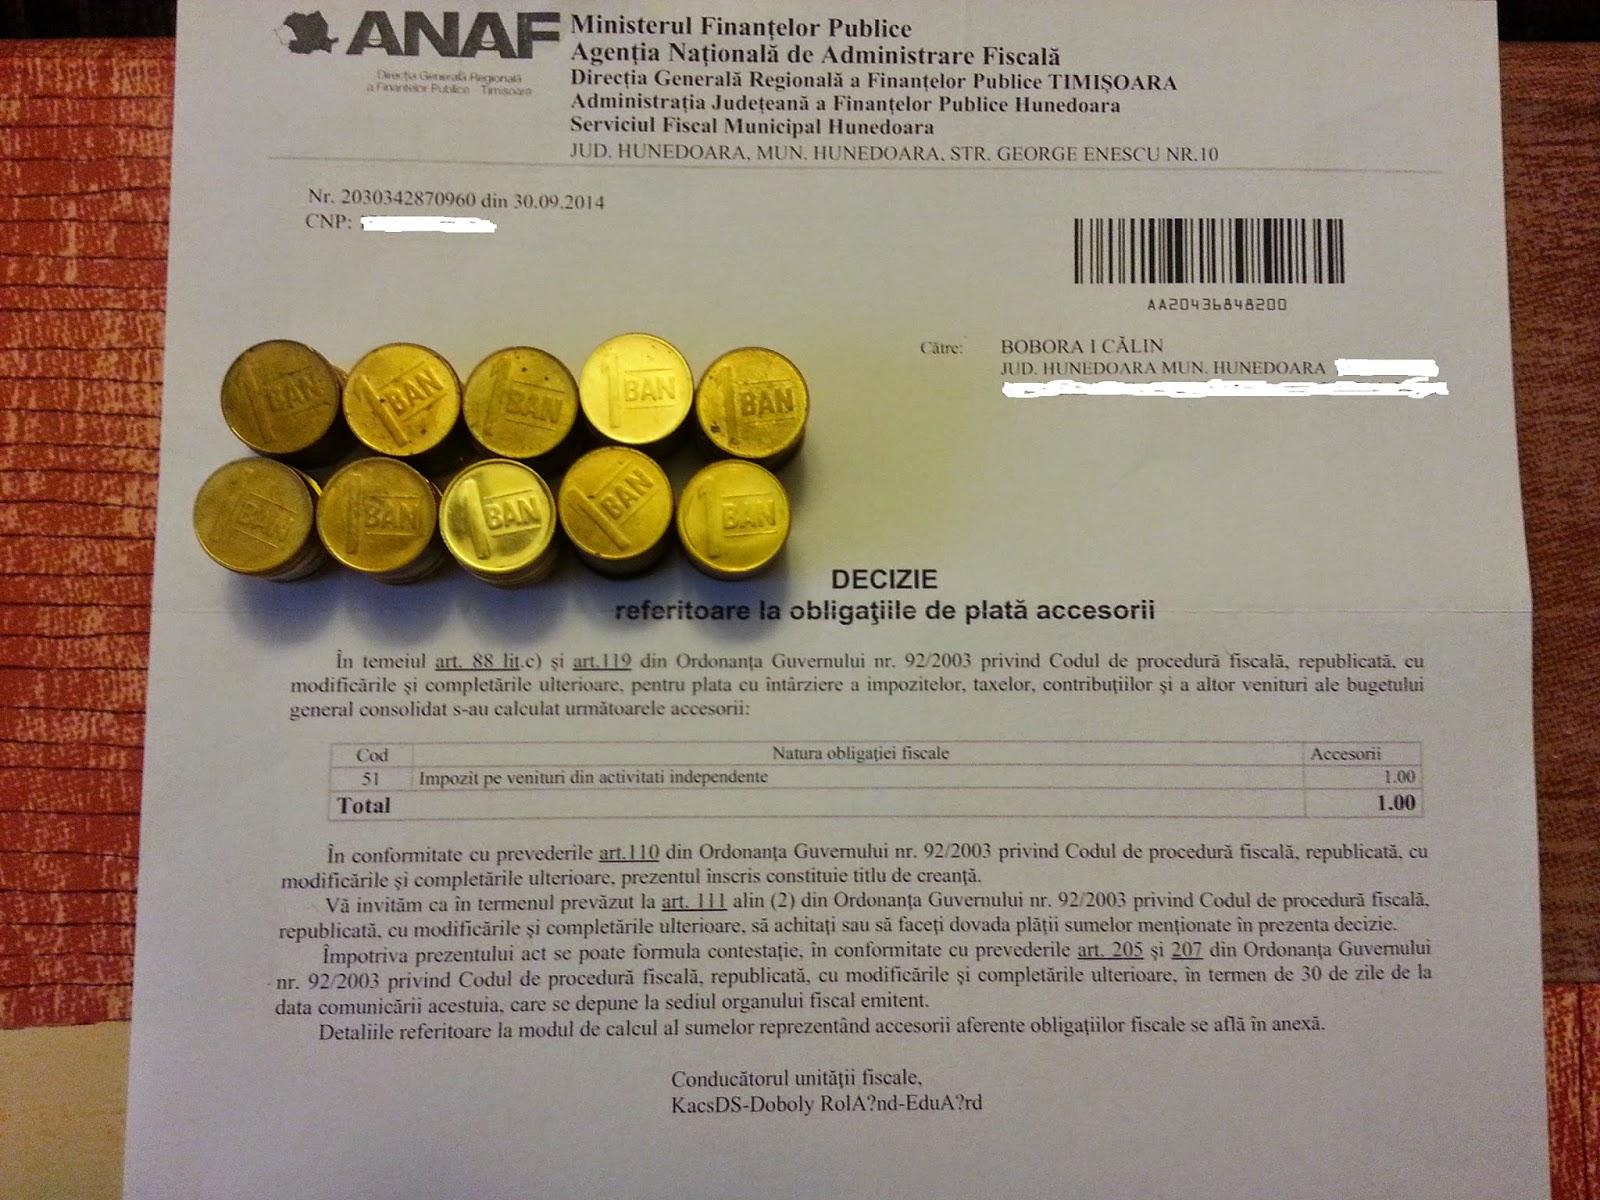 Imi platesc datoria la ANAF cu Monede de 1 BAN